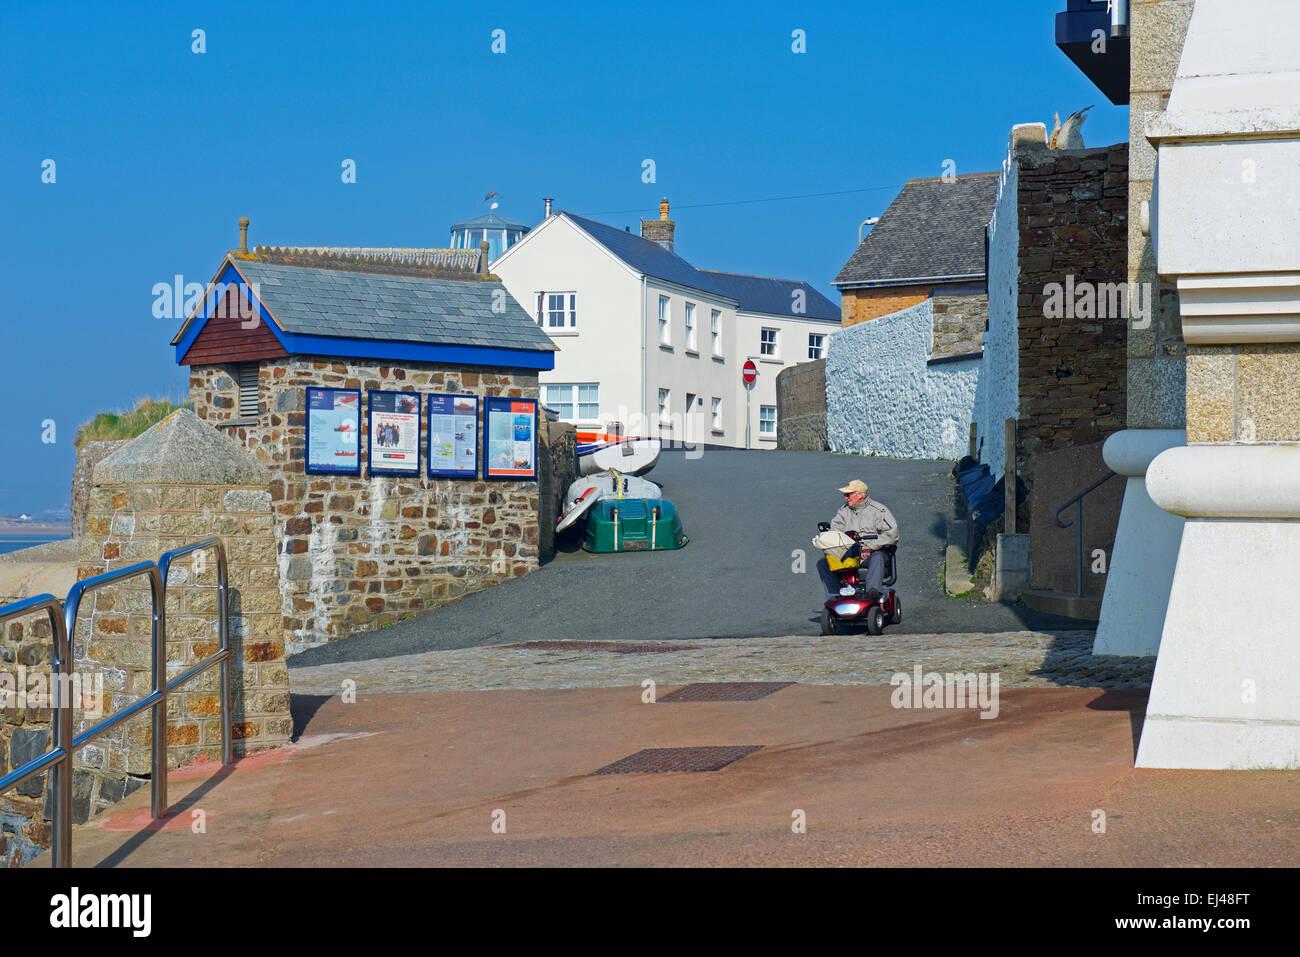 Senior woman auf Mobilität Roller, Appledore, Devon, England UK Stockbild